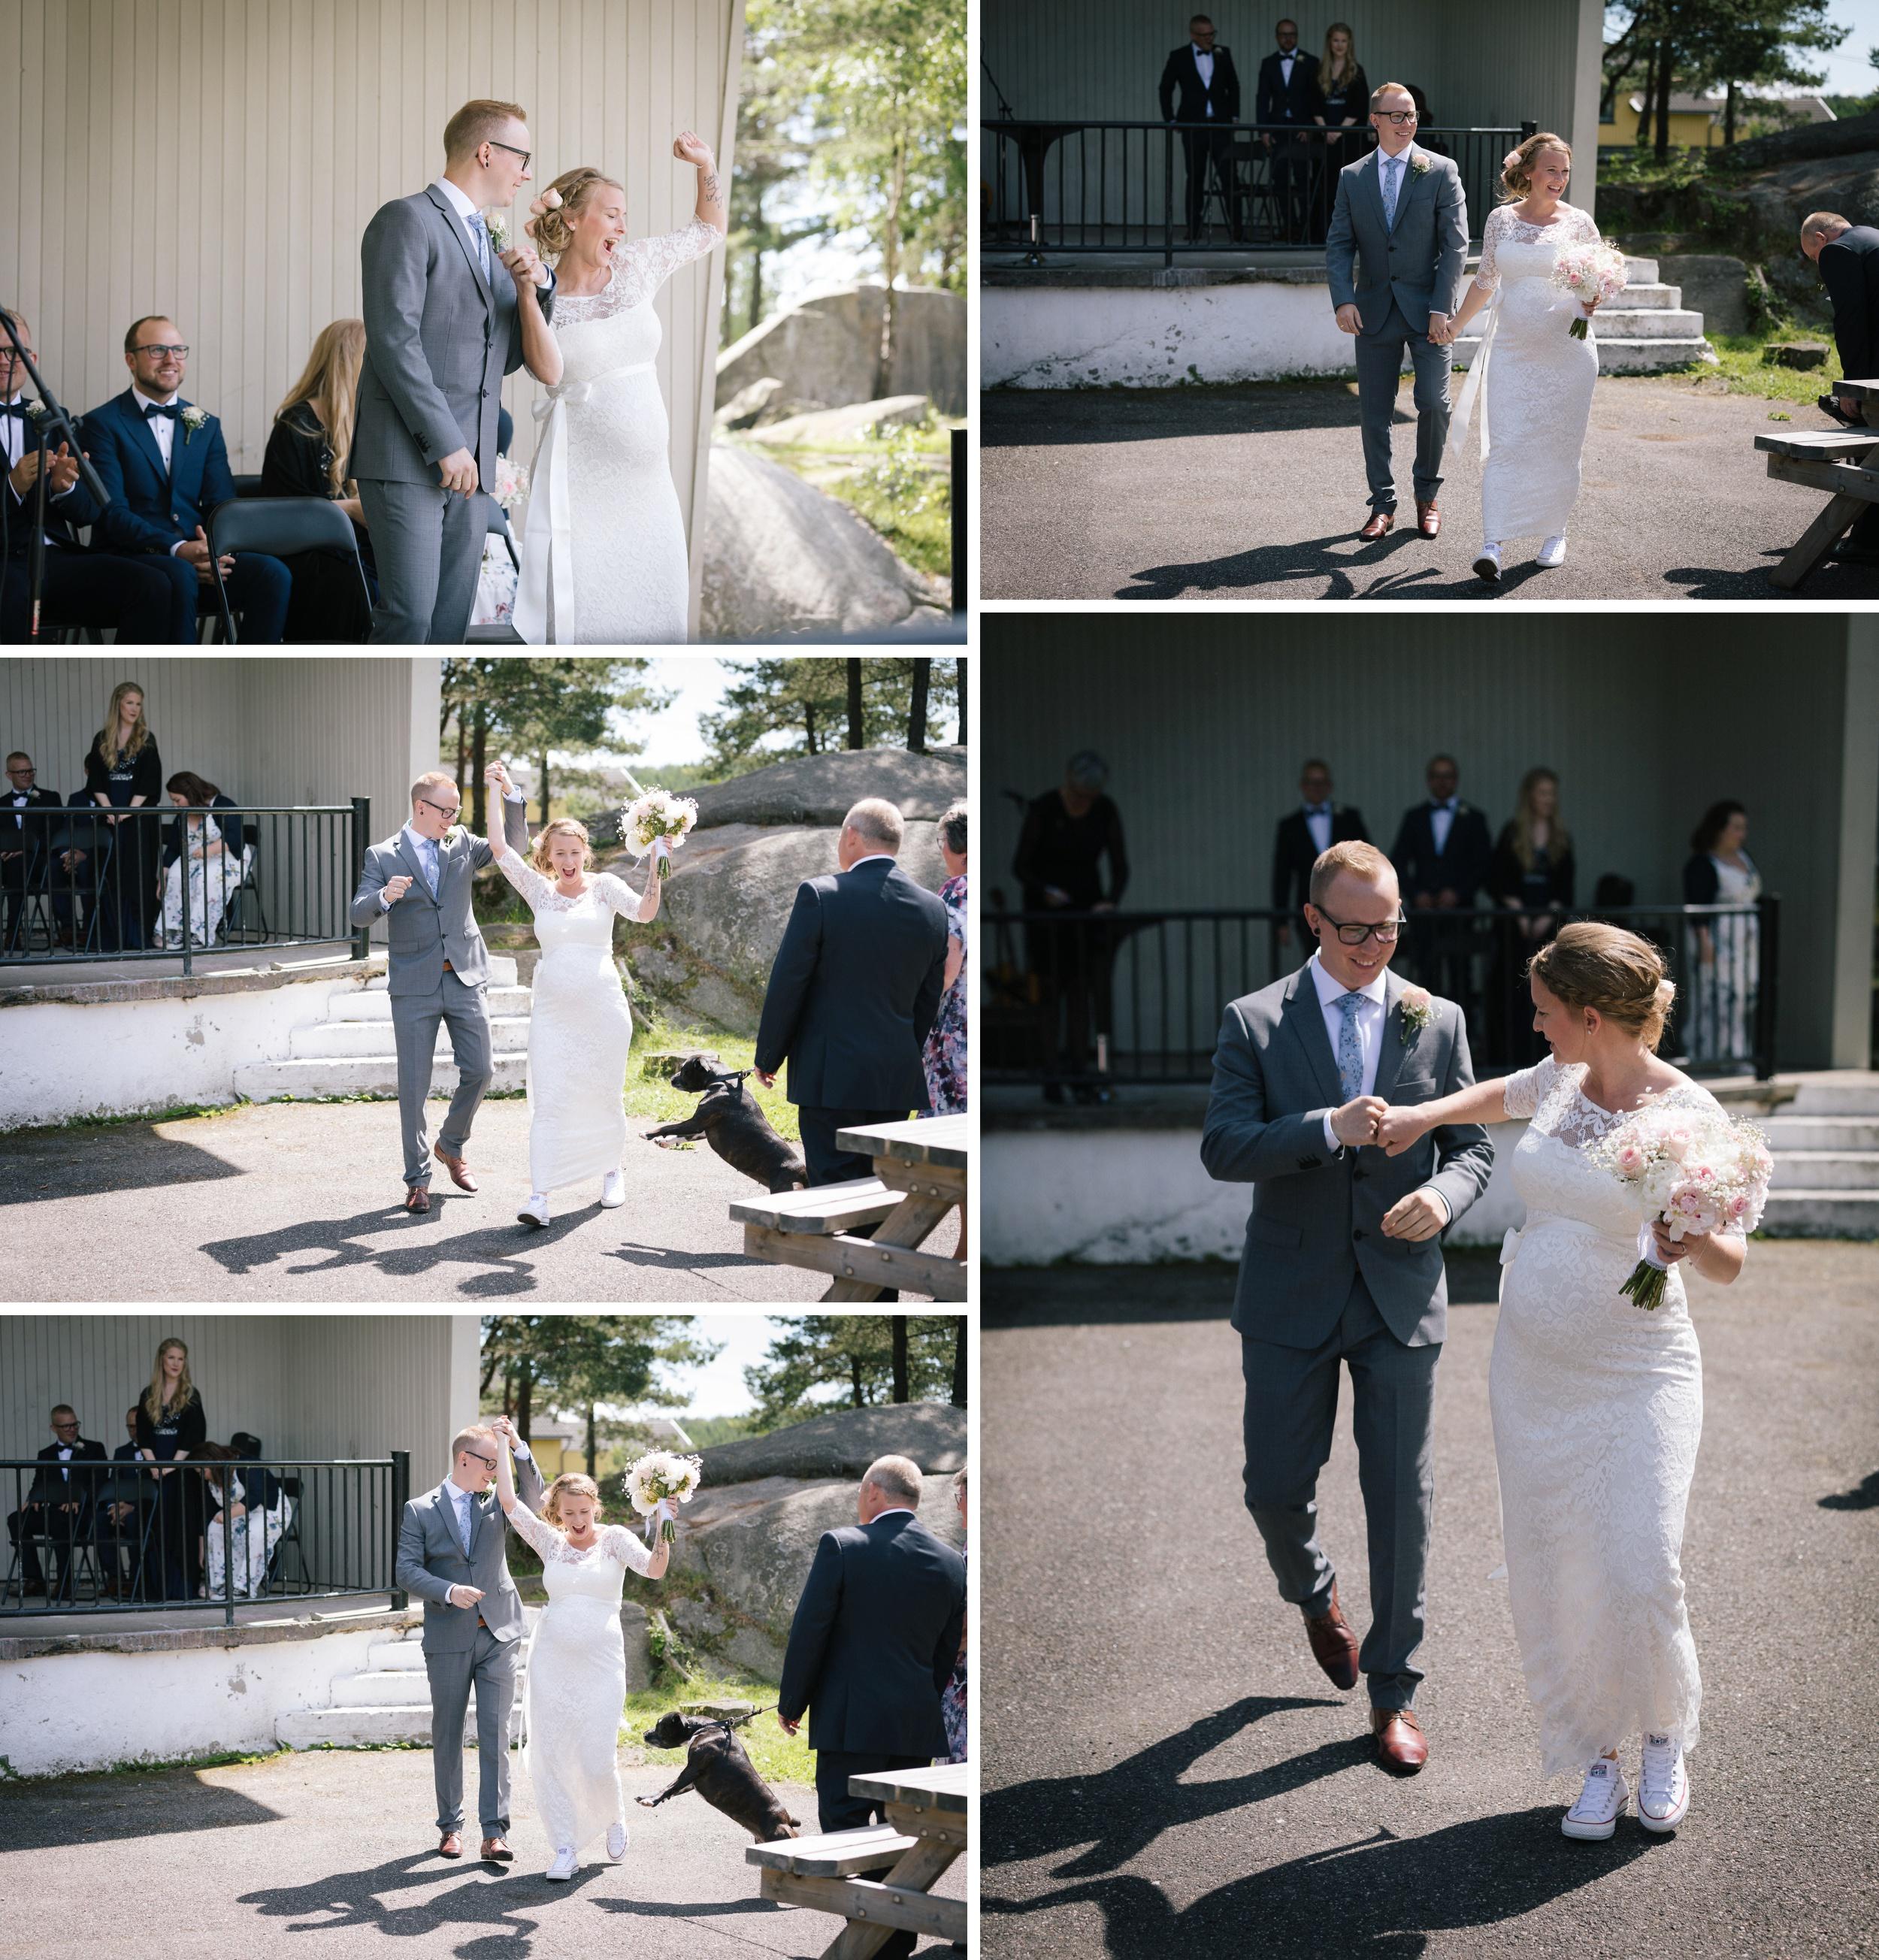 bryllup-bryllupsfotografering-bryllupsfotograf-sarpsborg-20170617-_H2A2143anneli_phillip_WEB.jpg